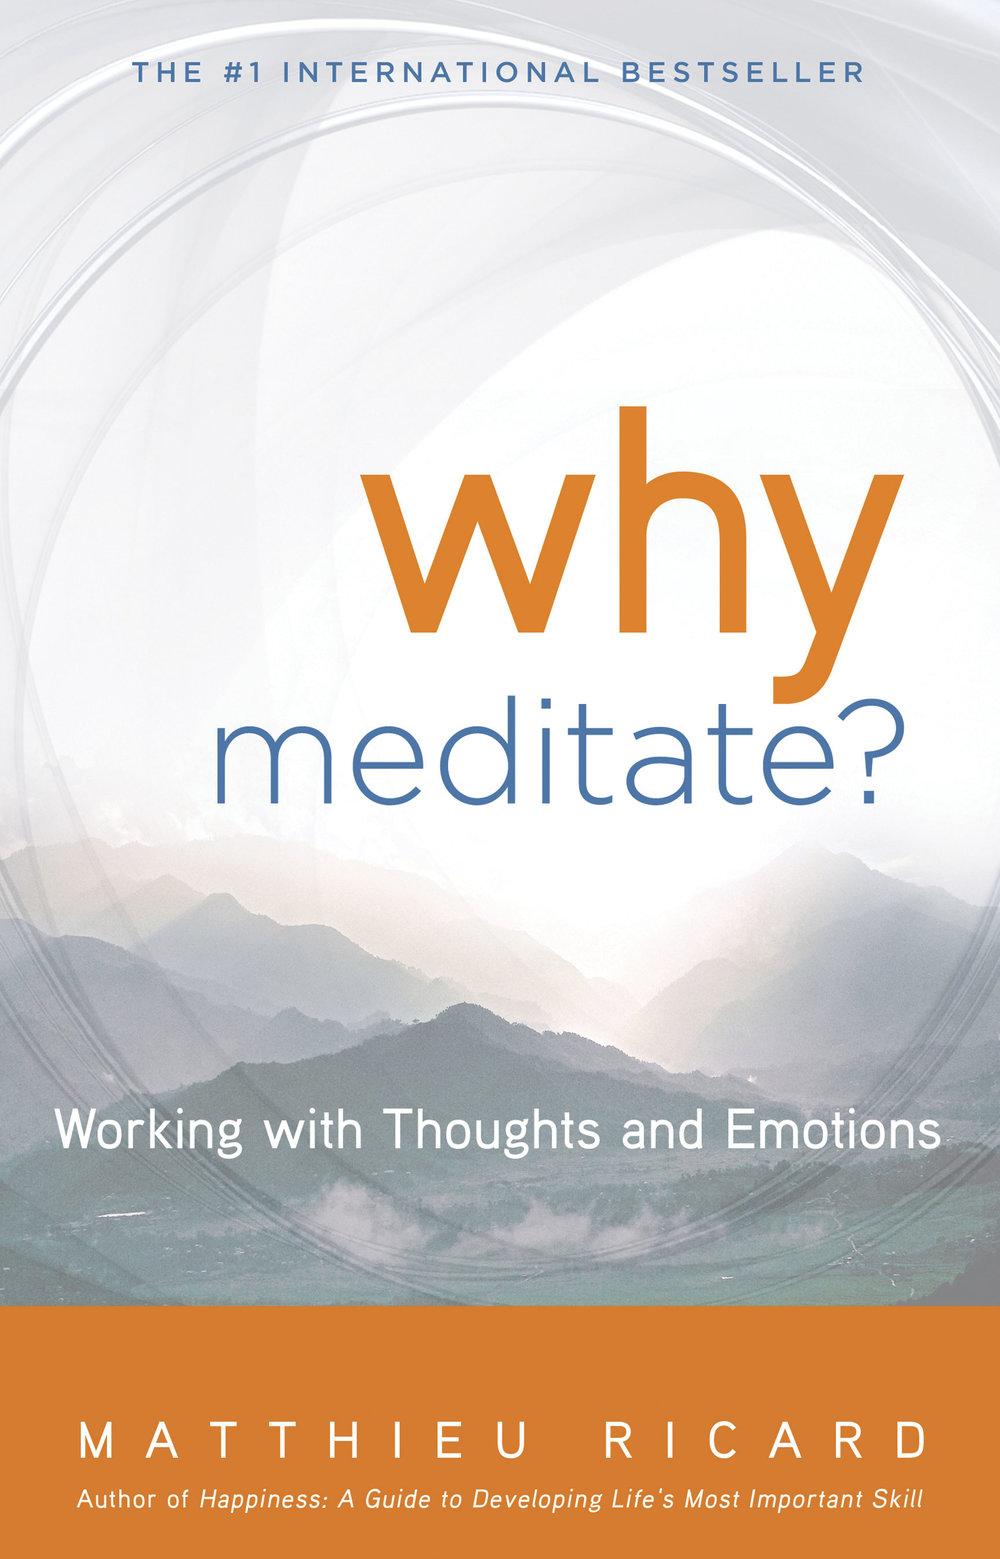 Why Meditate- Matthieu Ricard